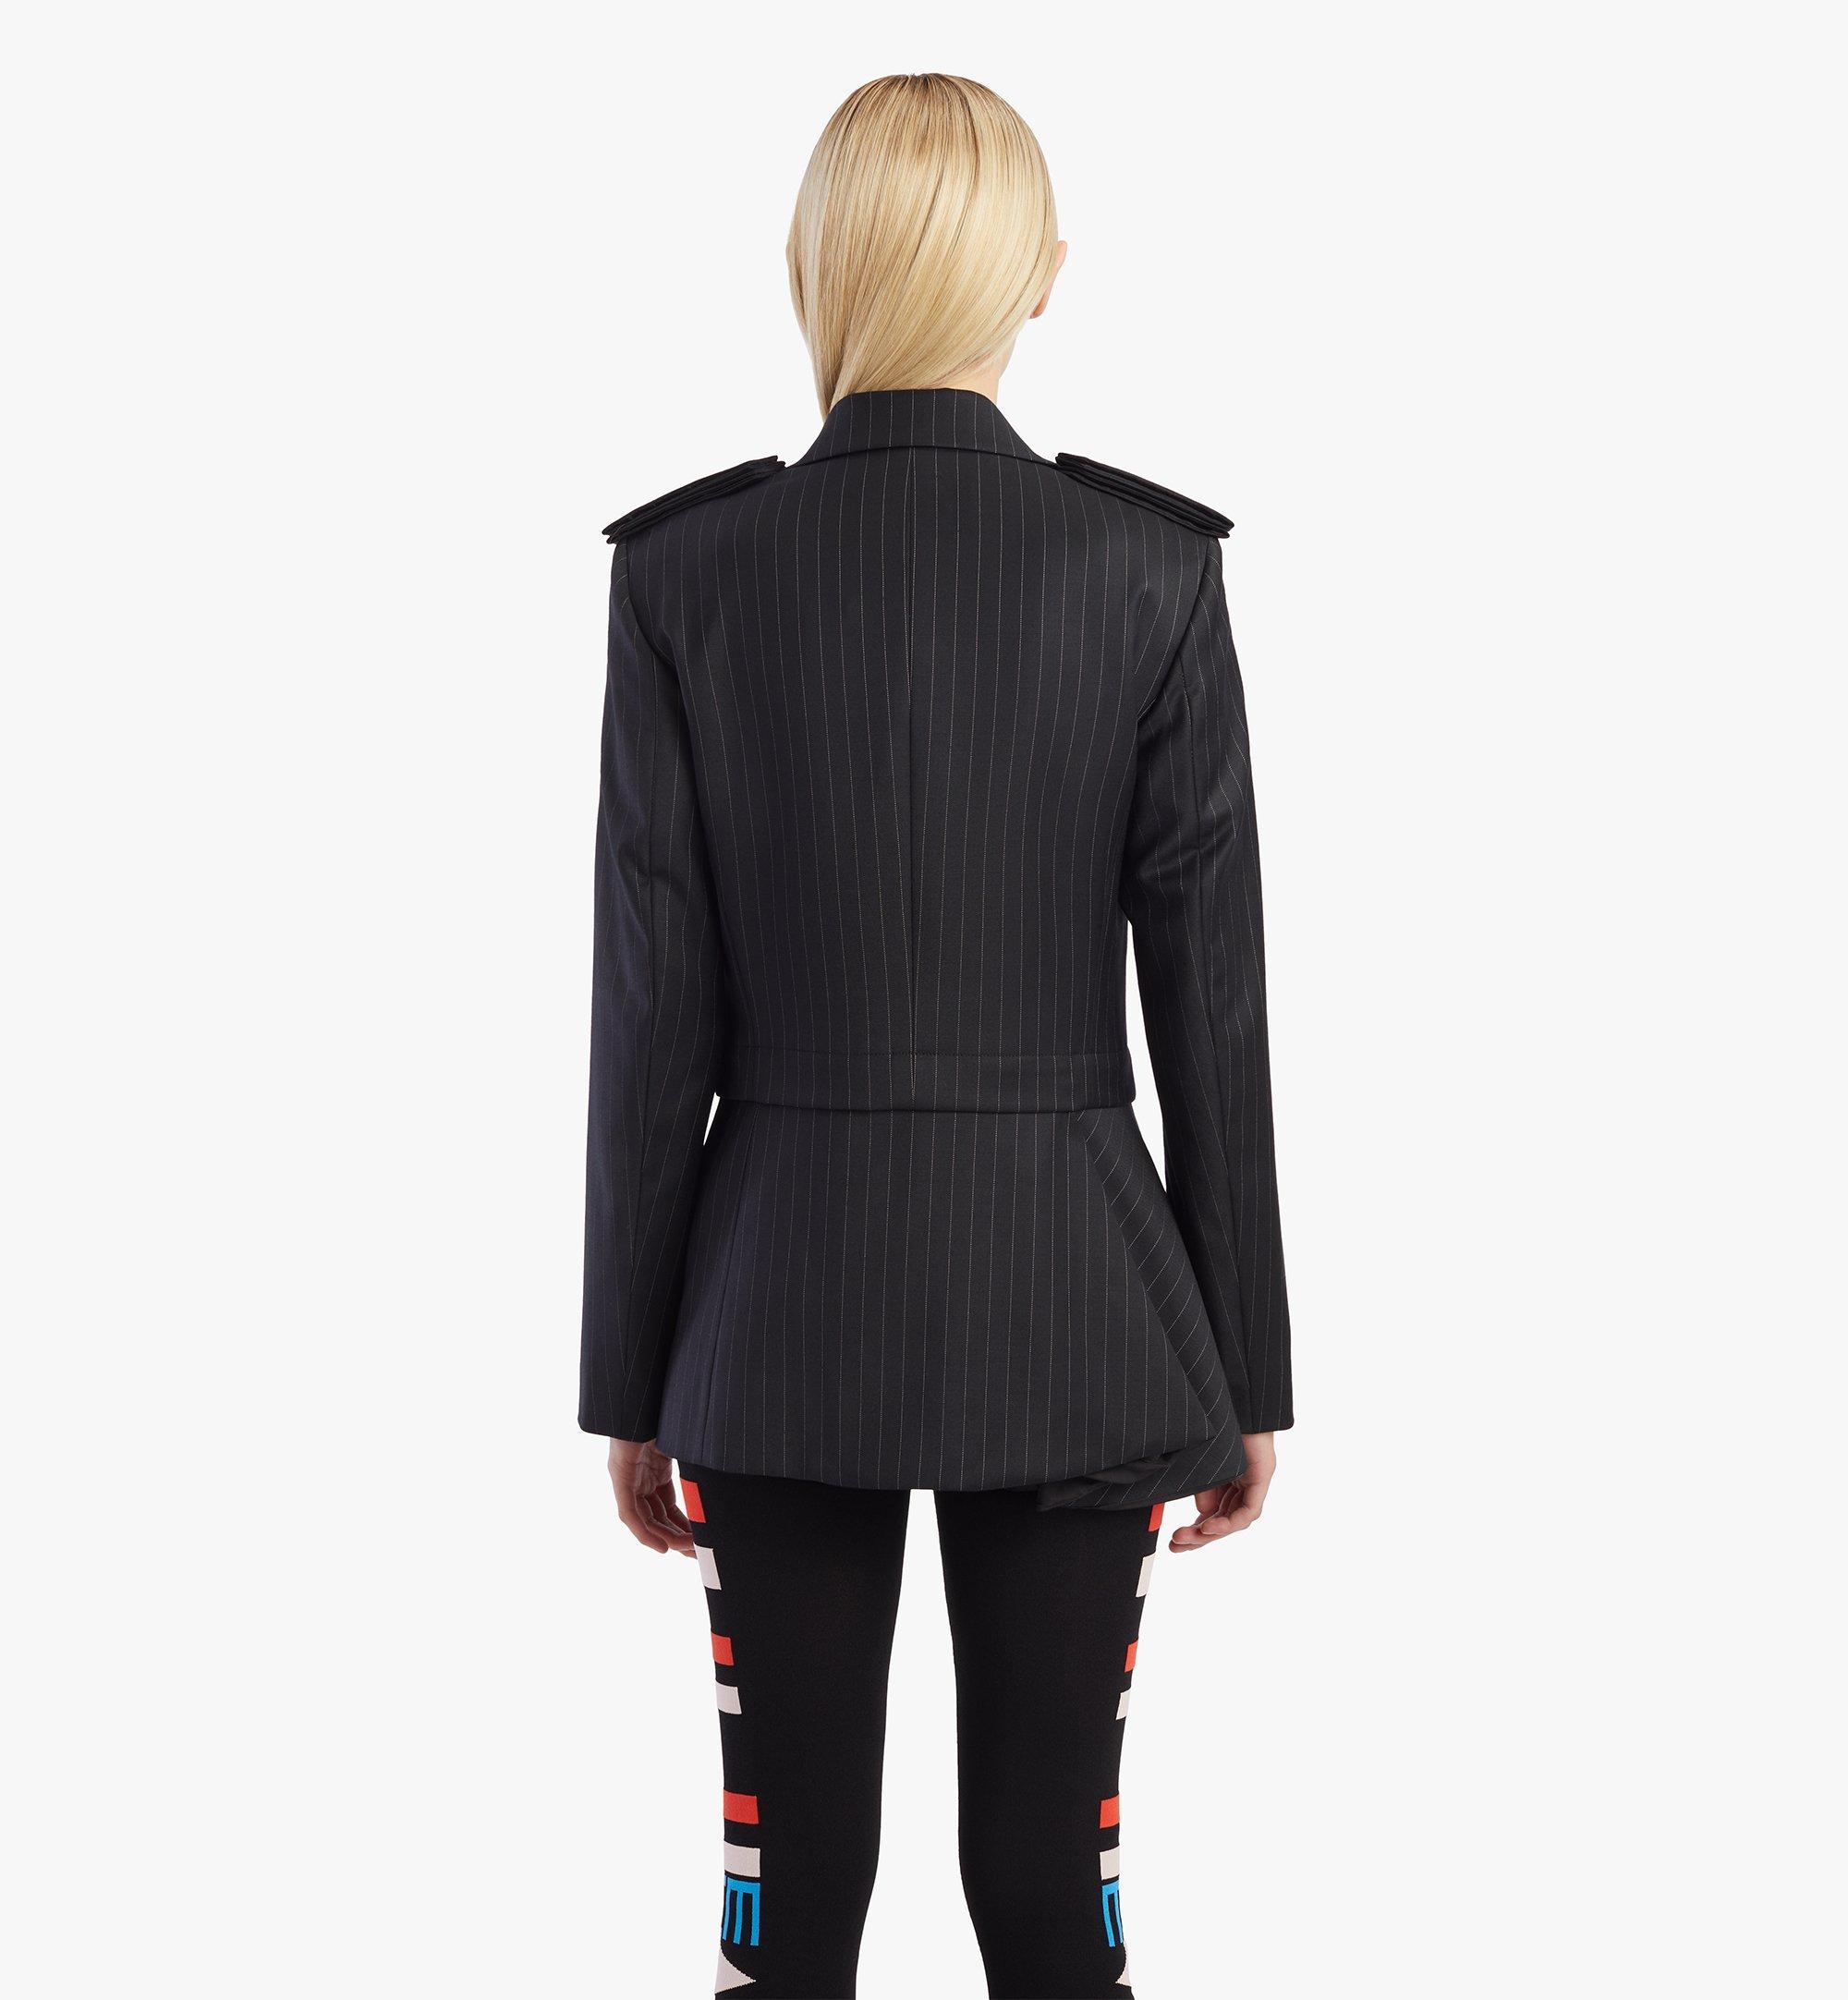 MCM 女士肩章羊毛西裝外套 Black MFJBSMM02B2040 更多視圖 6